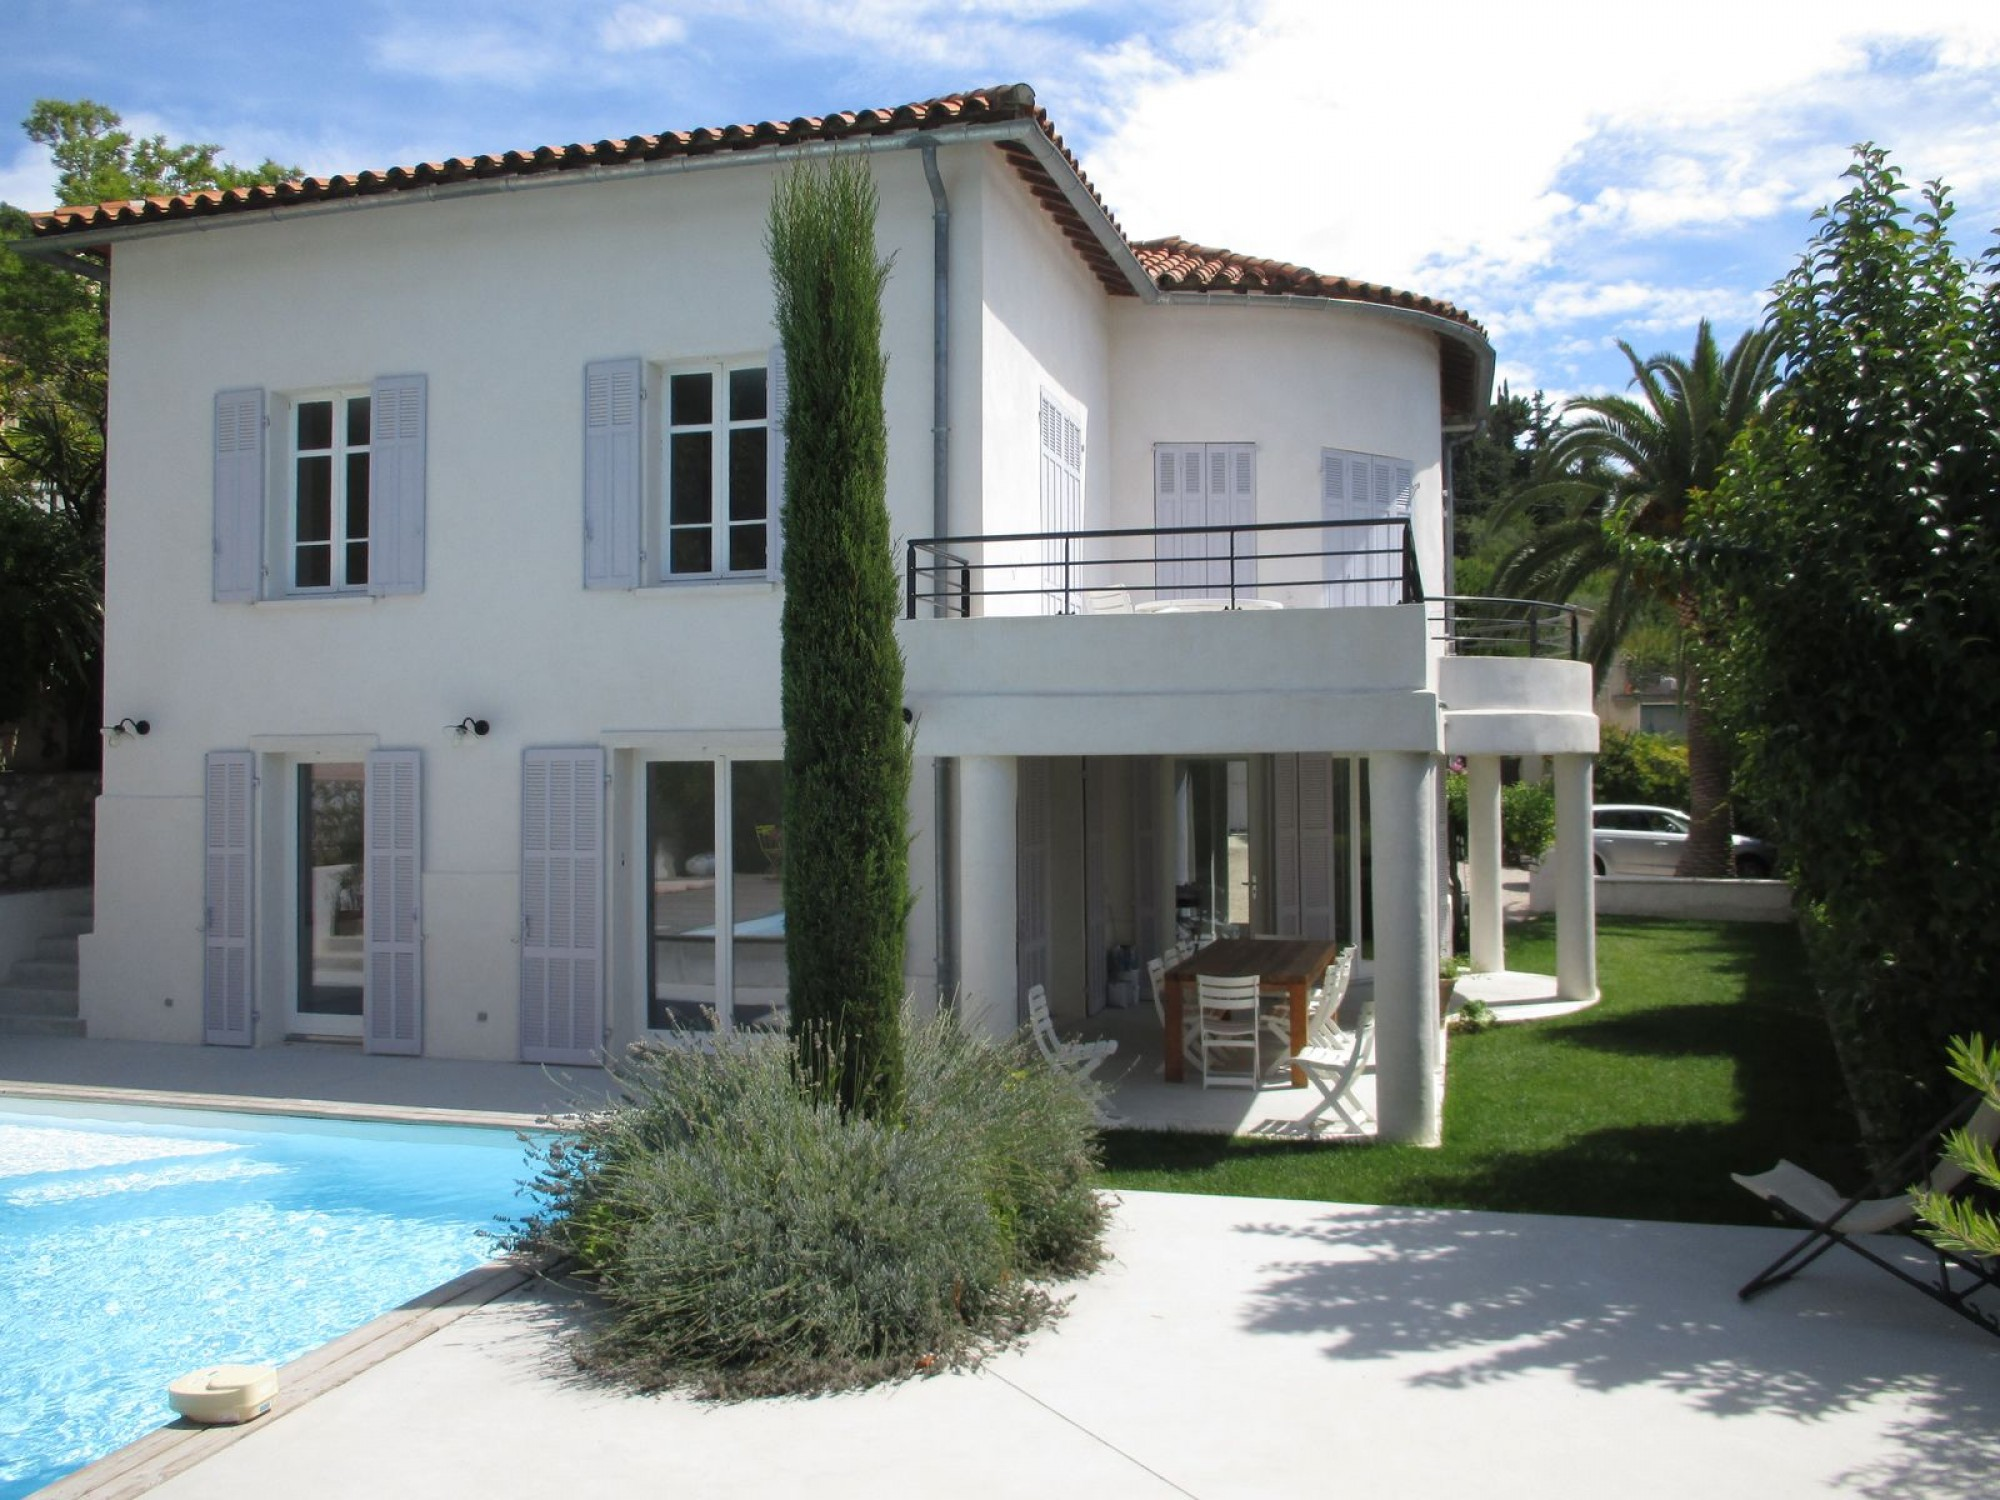 location maison 6 chambres piscine